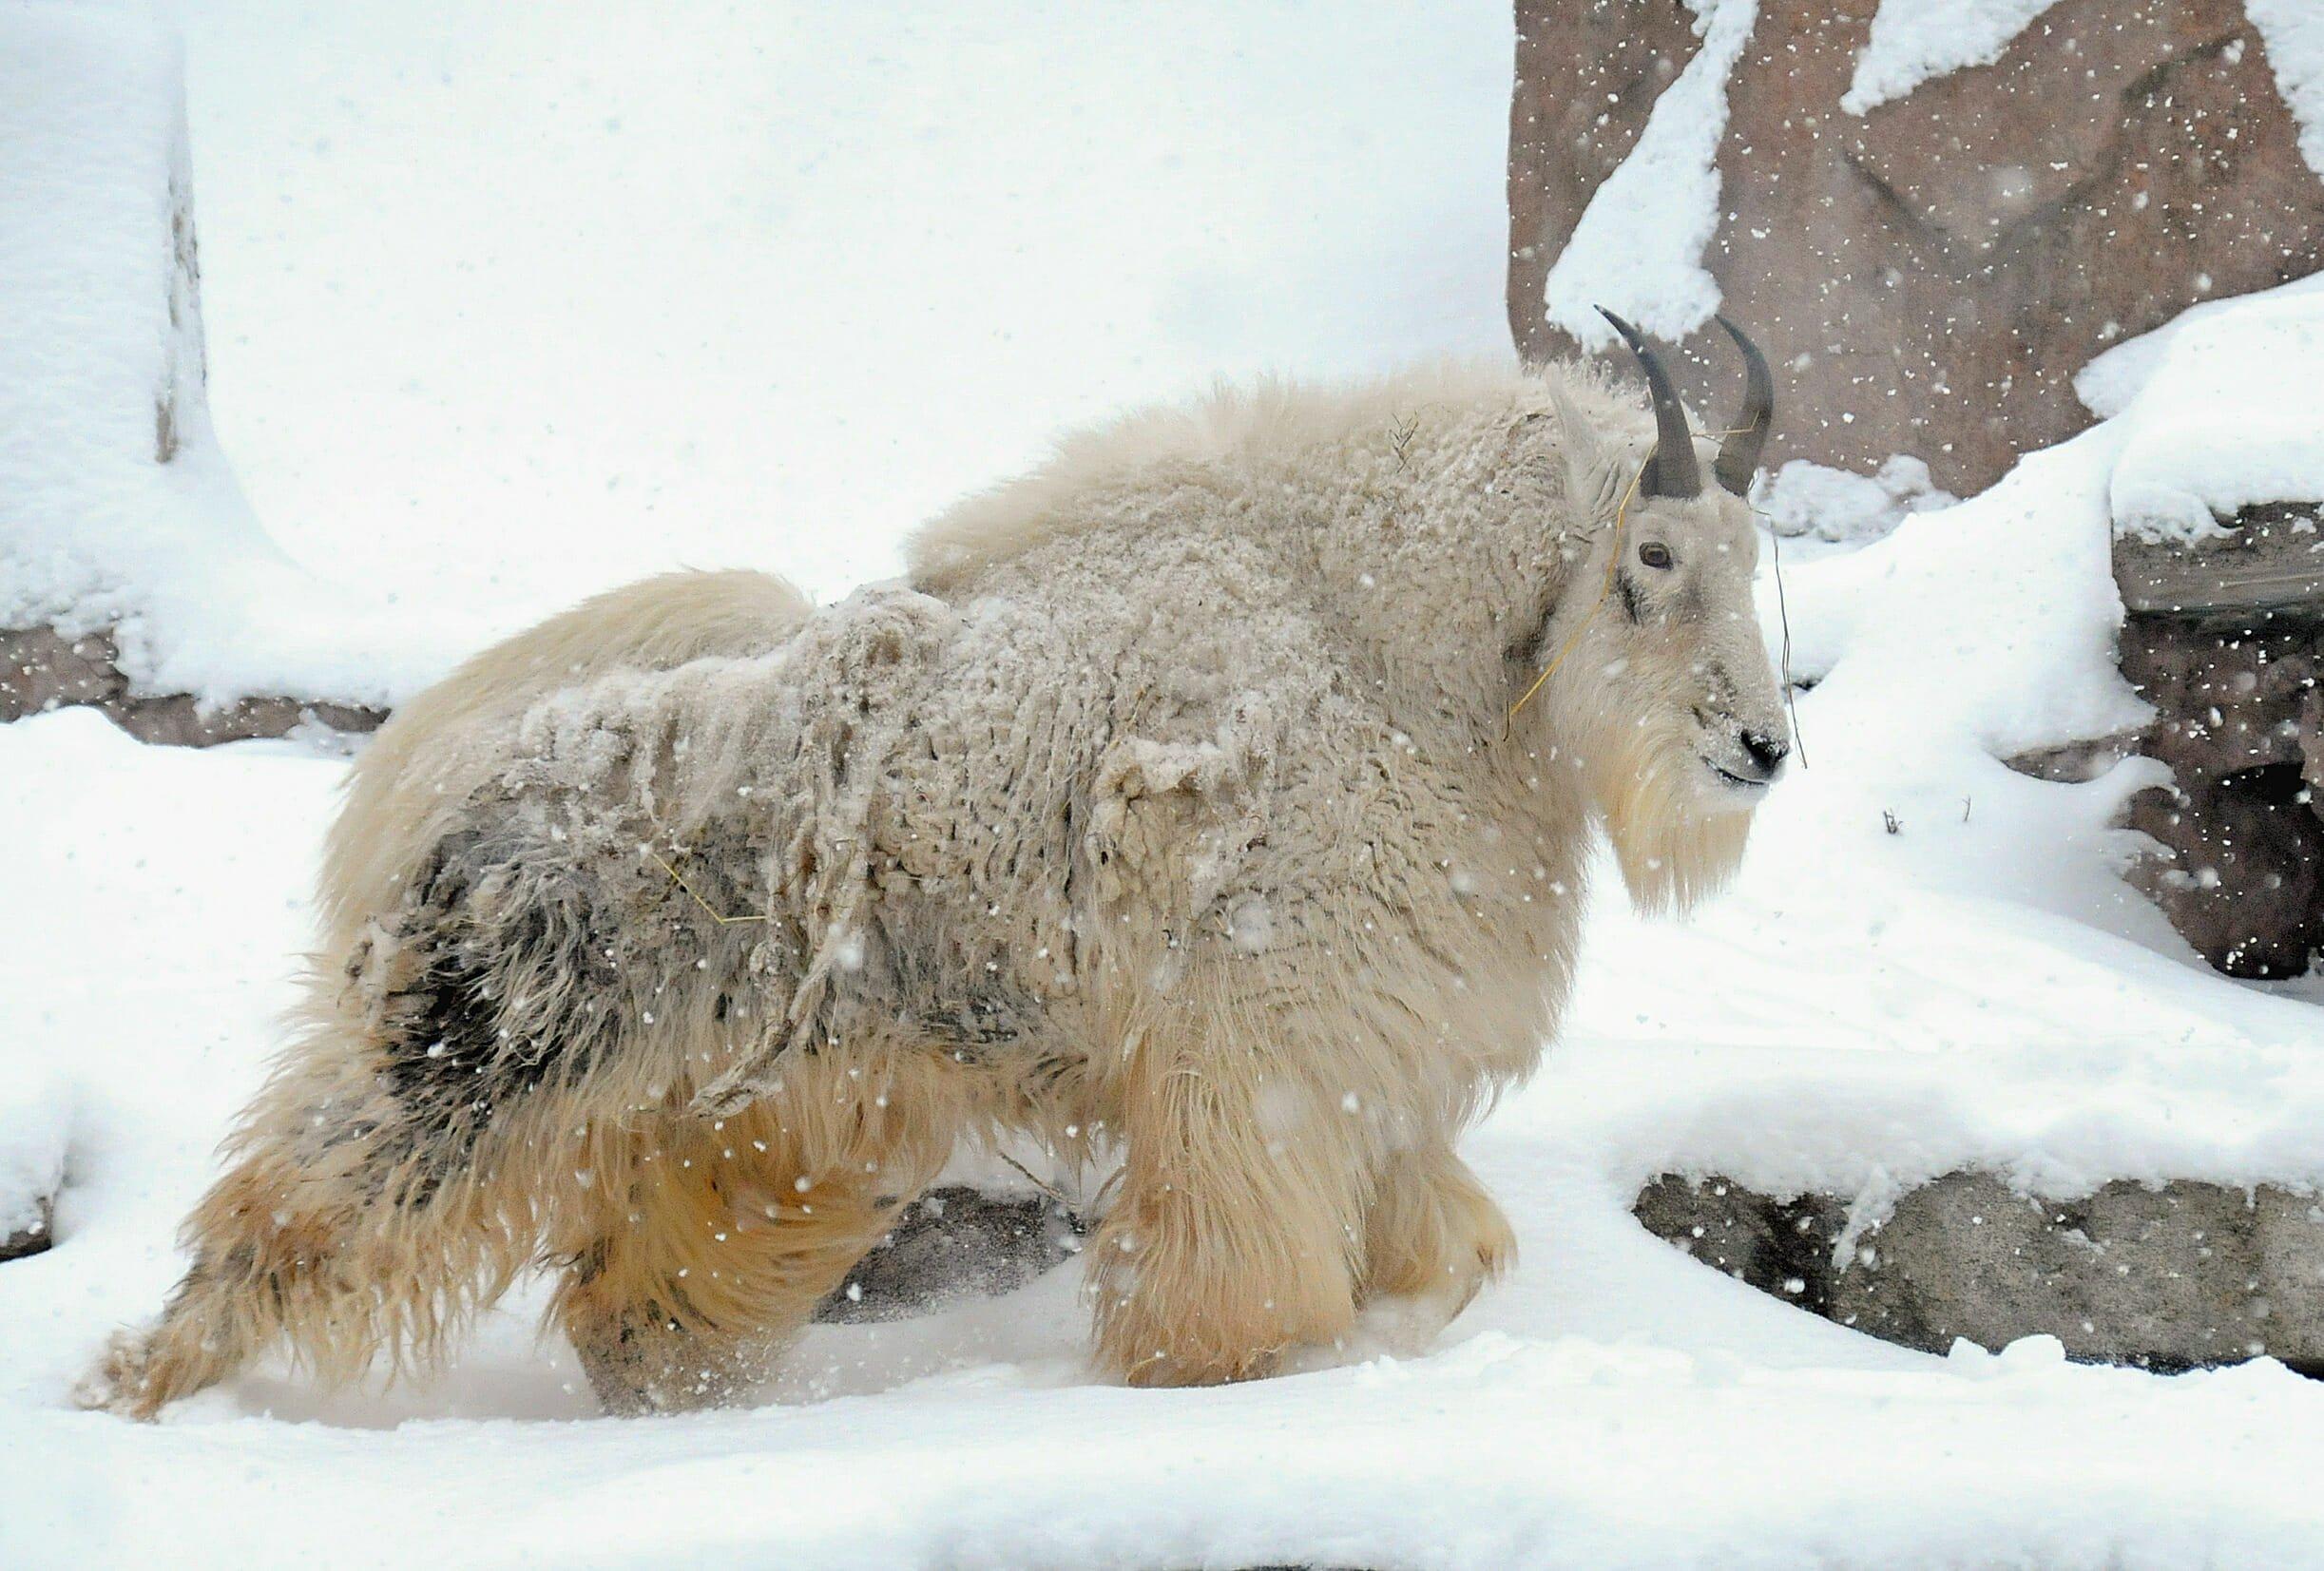 https://i0.wp.com/www.thewildlifediaries.com/wp-content/uploads/2010/01/mountain-goat.jpg